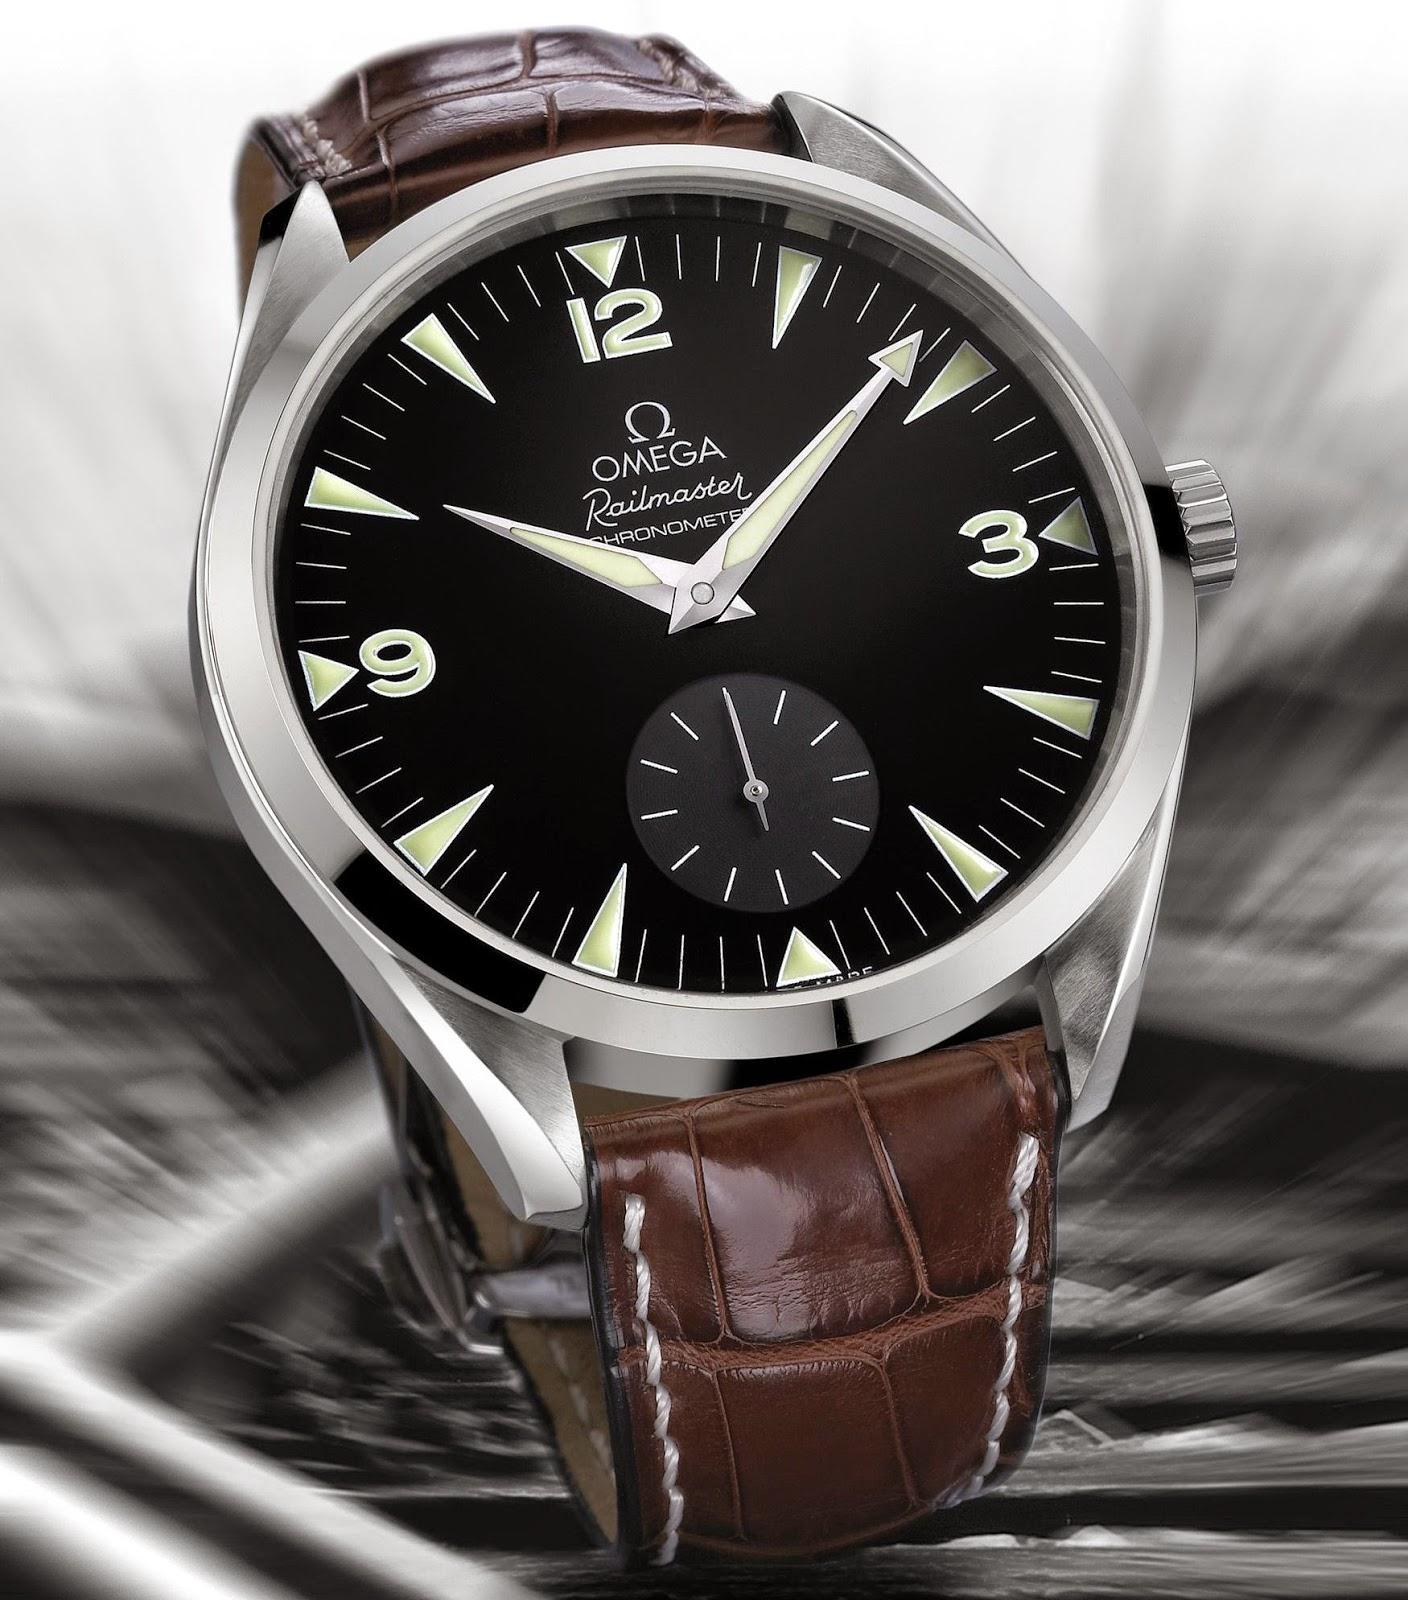 OMEGA Railmaster 49.2mm manual wound watch